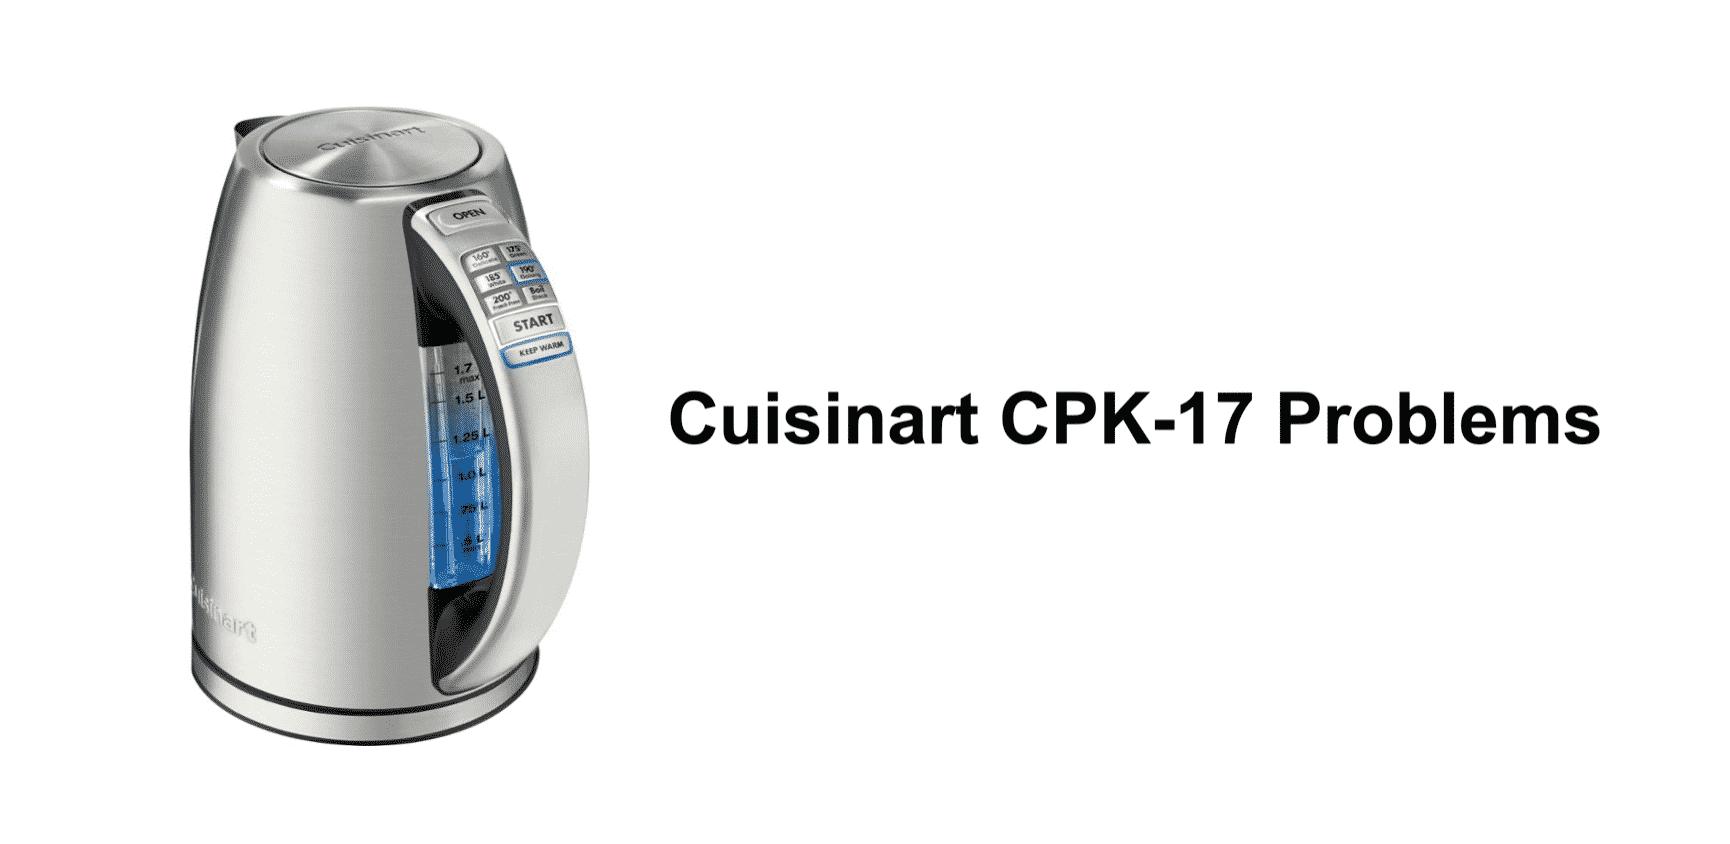 cuisinart cpk 17 problems